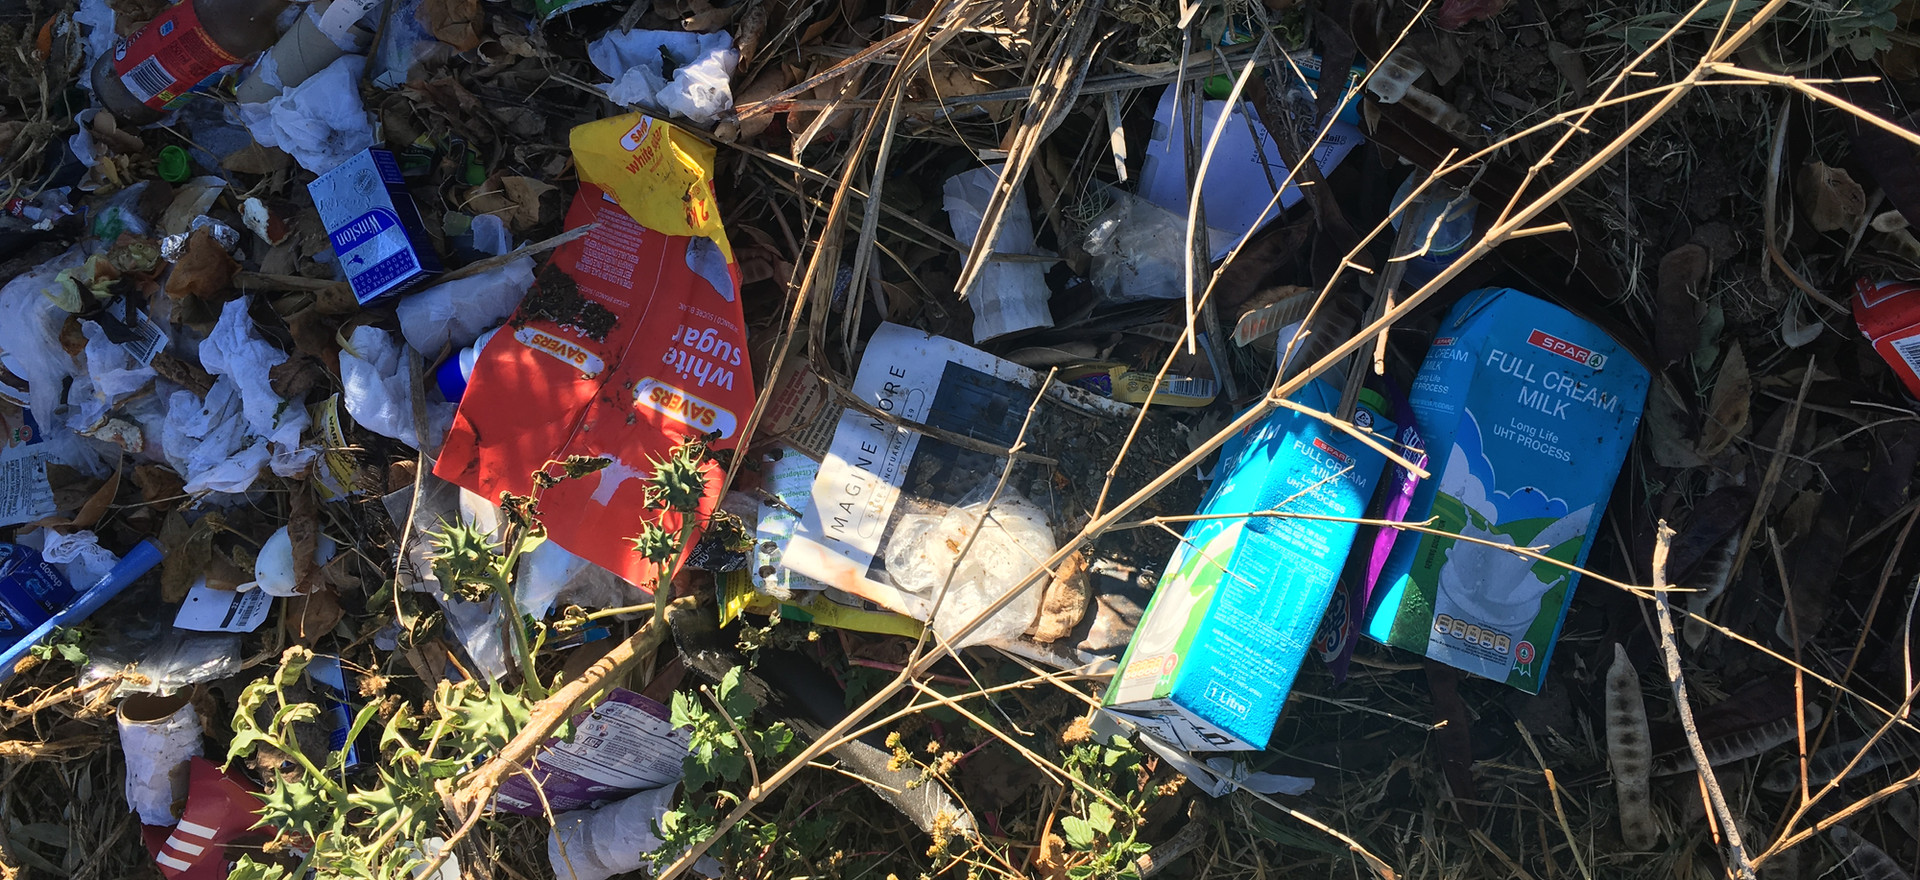 Pile of roadside waste, Somerset East